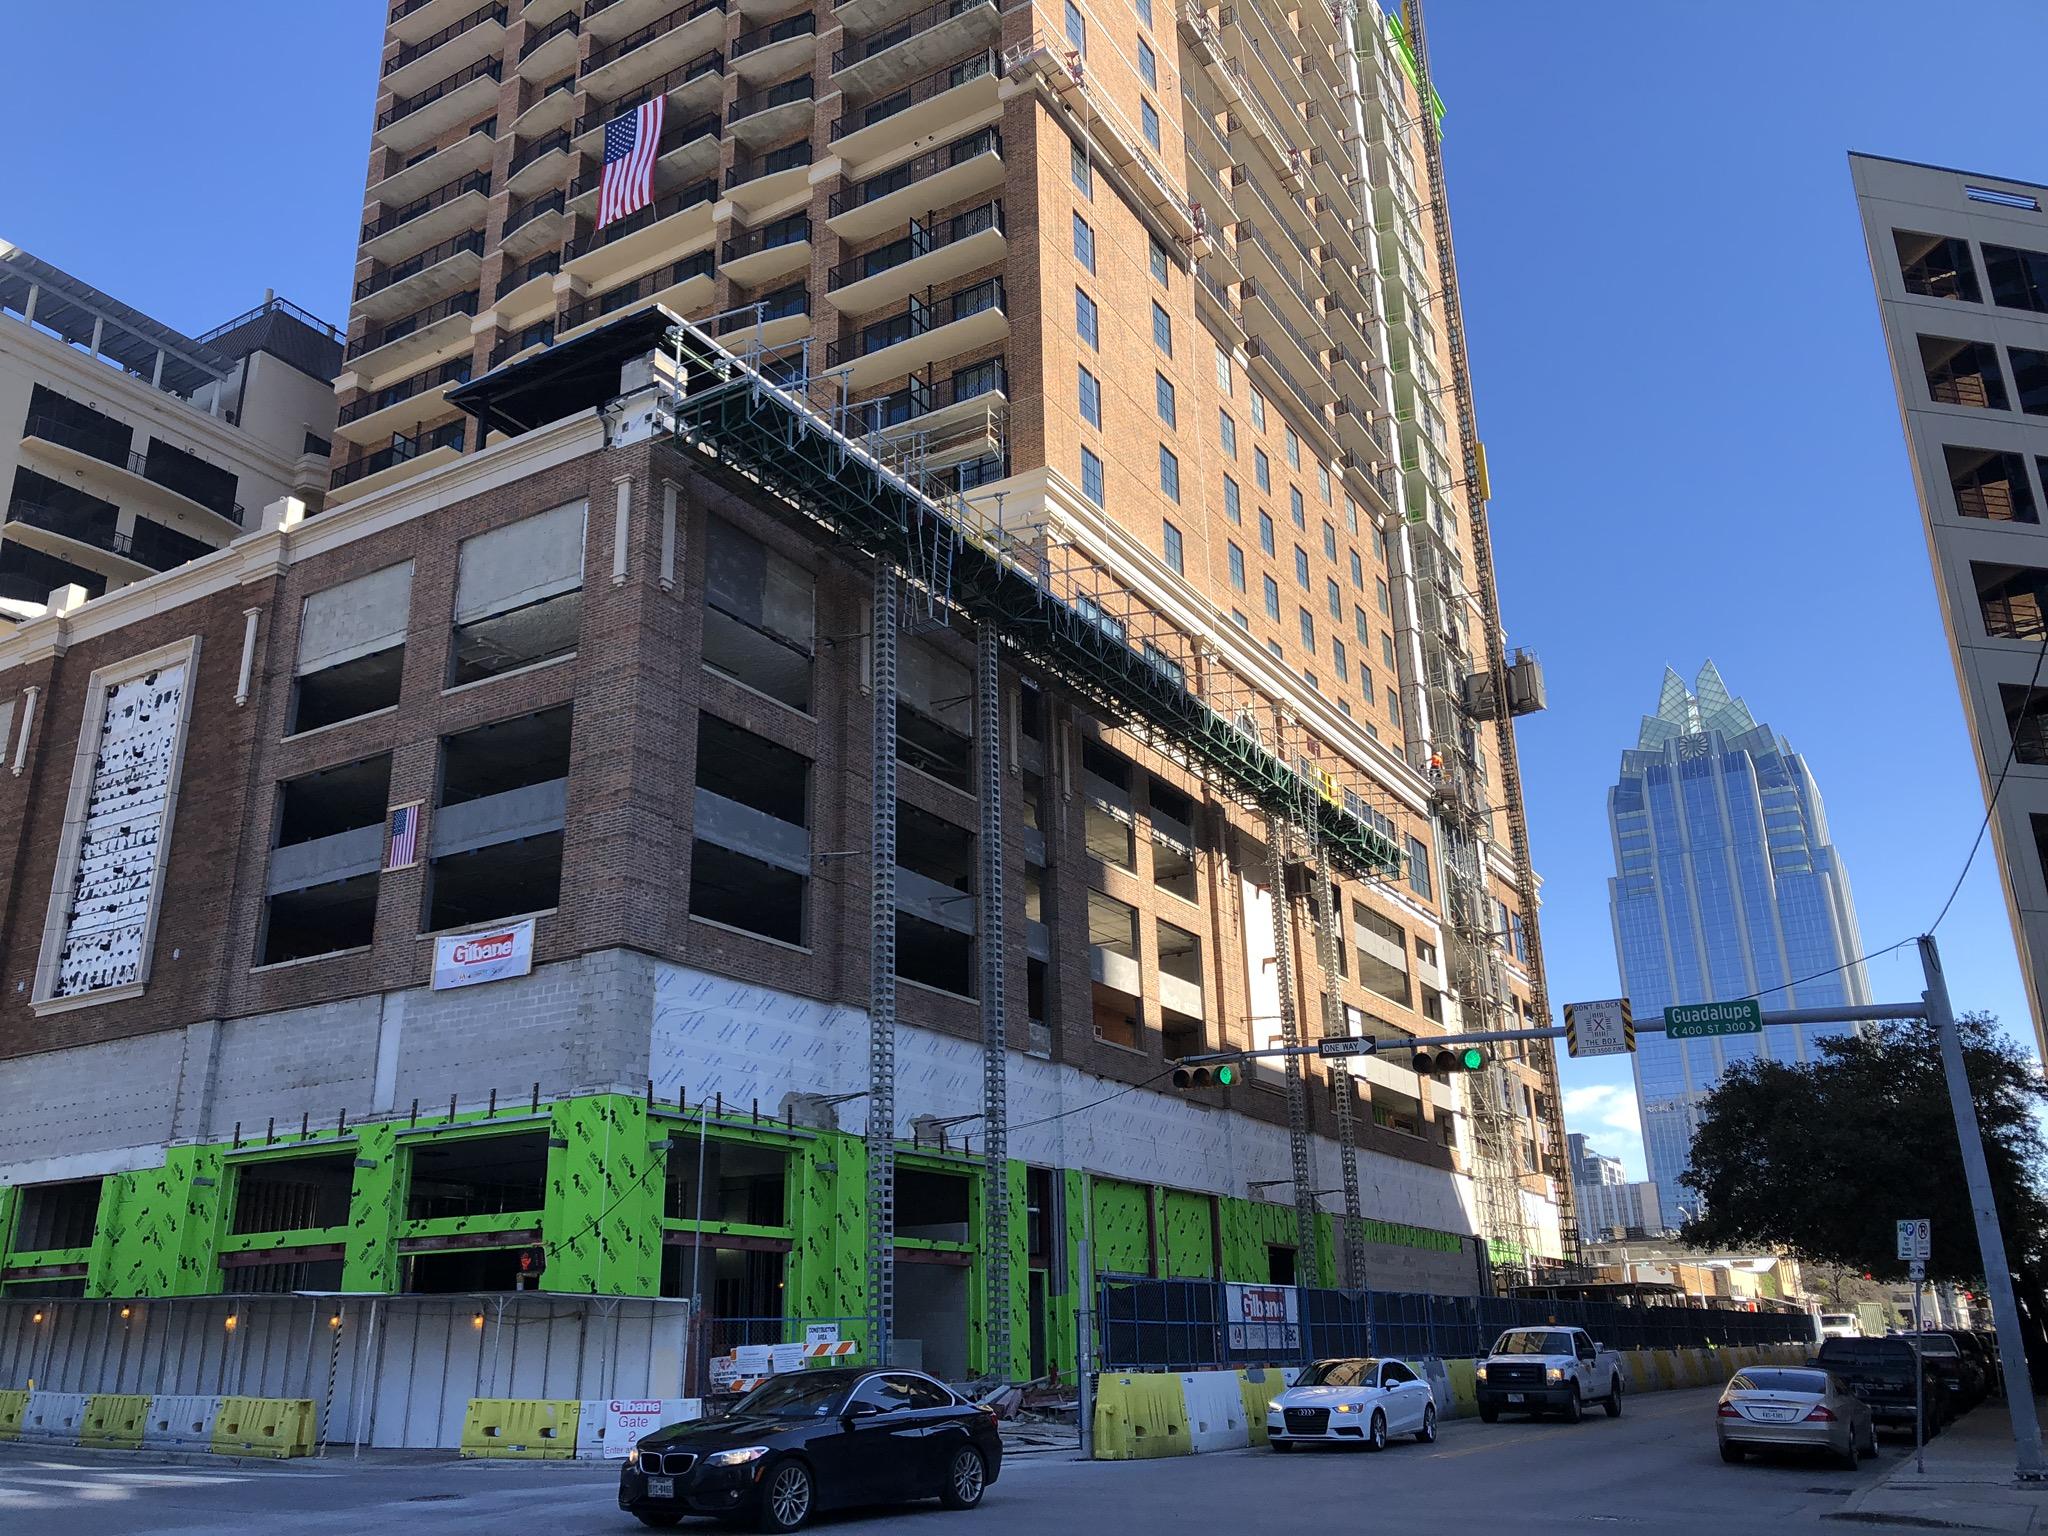 Hydro Mobile Mast Climbers Republic Square Austin Texas